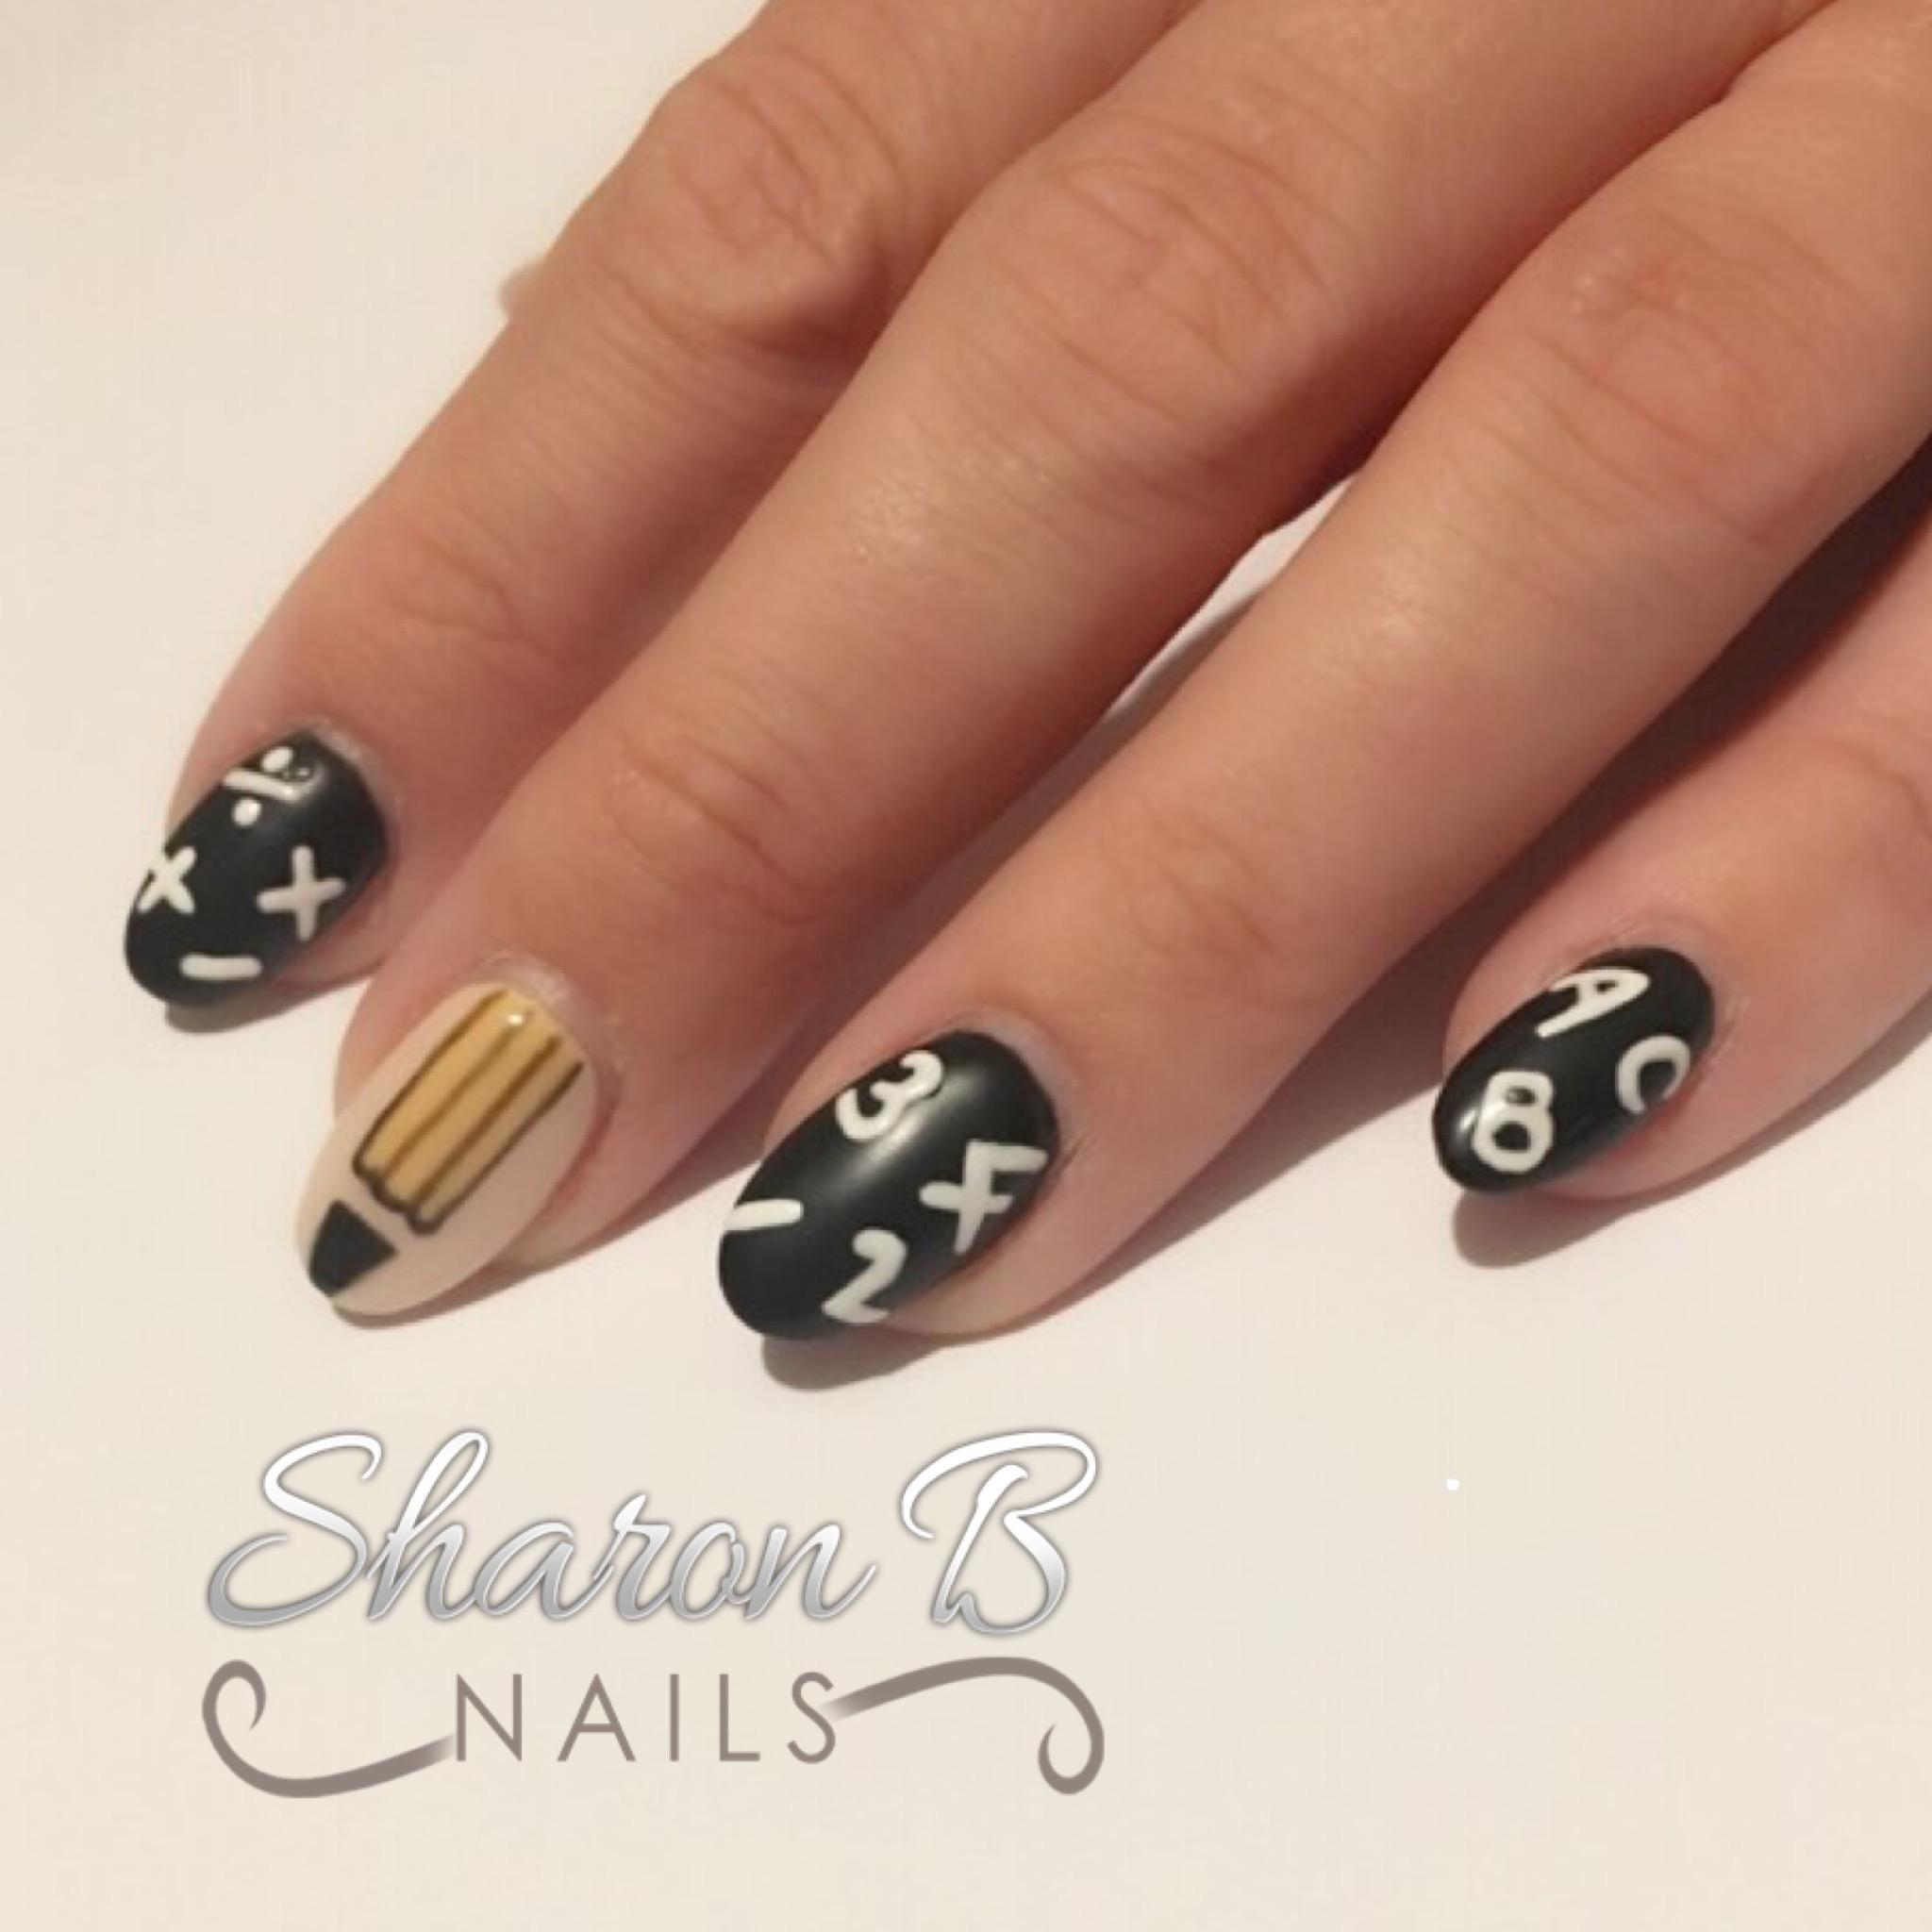 Sharon B Nails – Back To School Nails